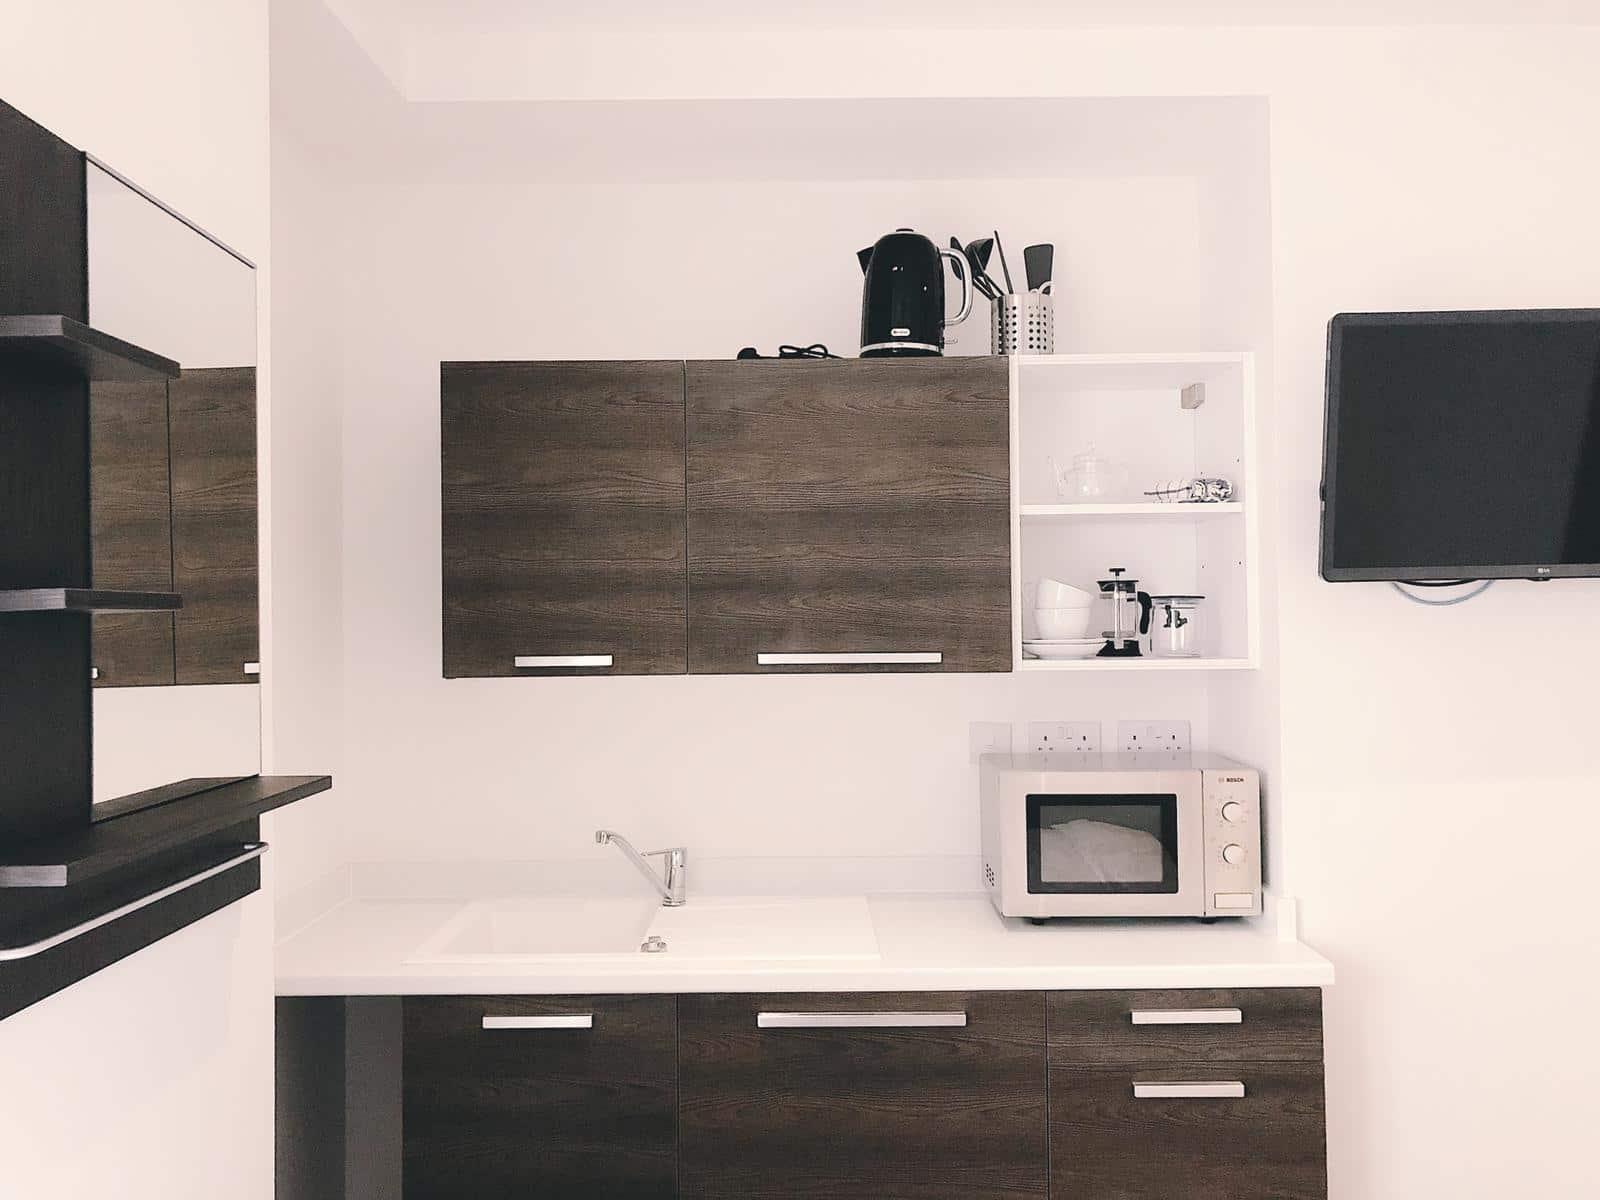 Apartment 7 Kitchen